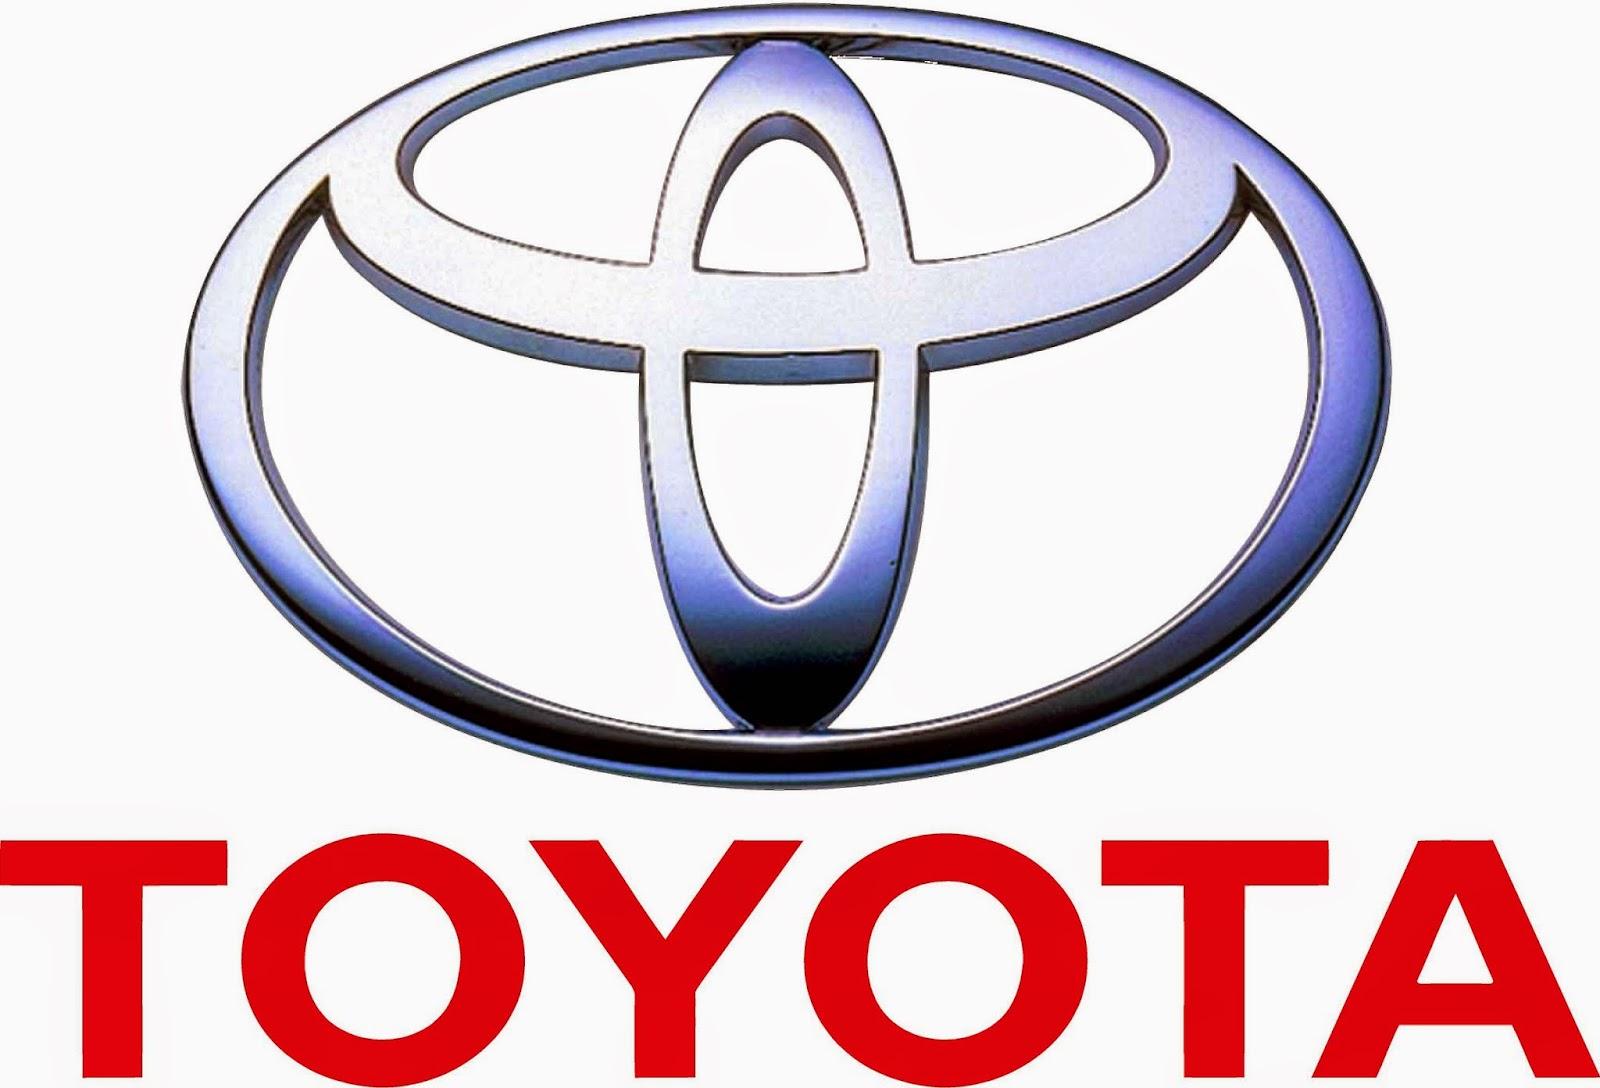 Perusahaan Toyota Sabet 3 Top Brand Award 2015